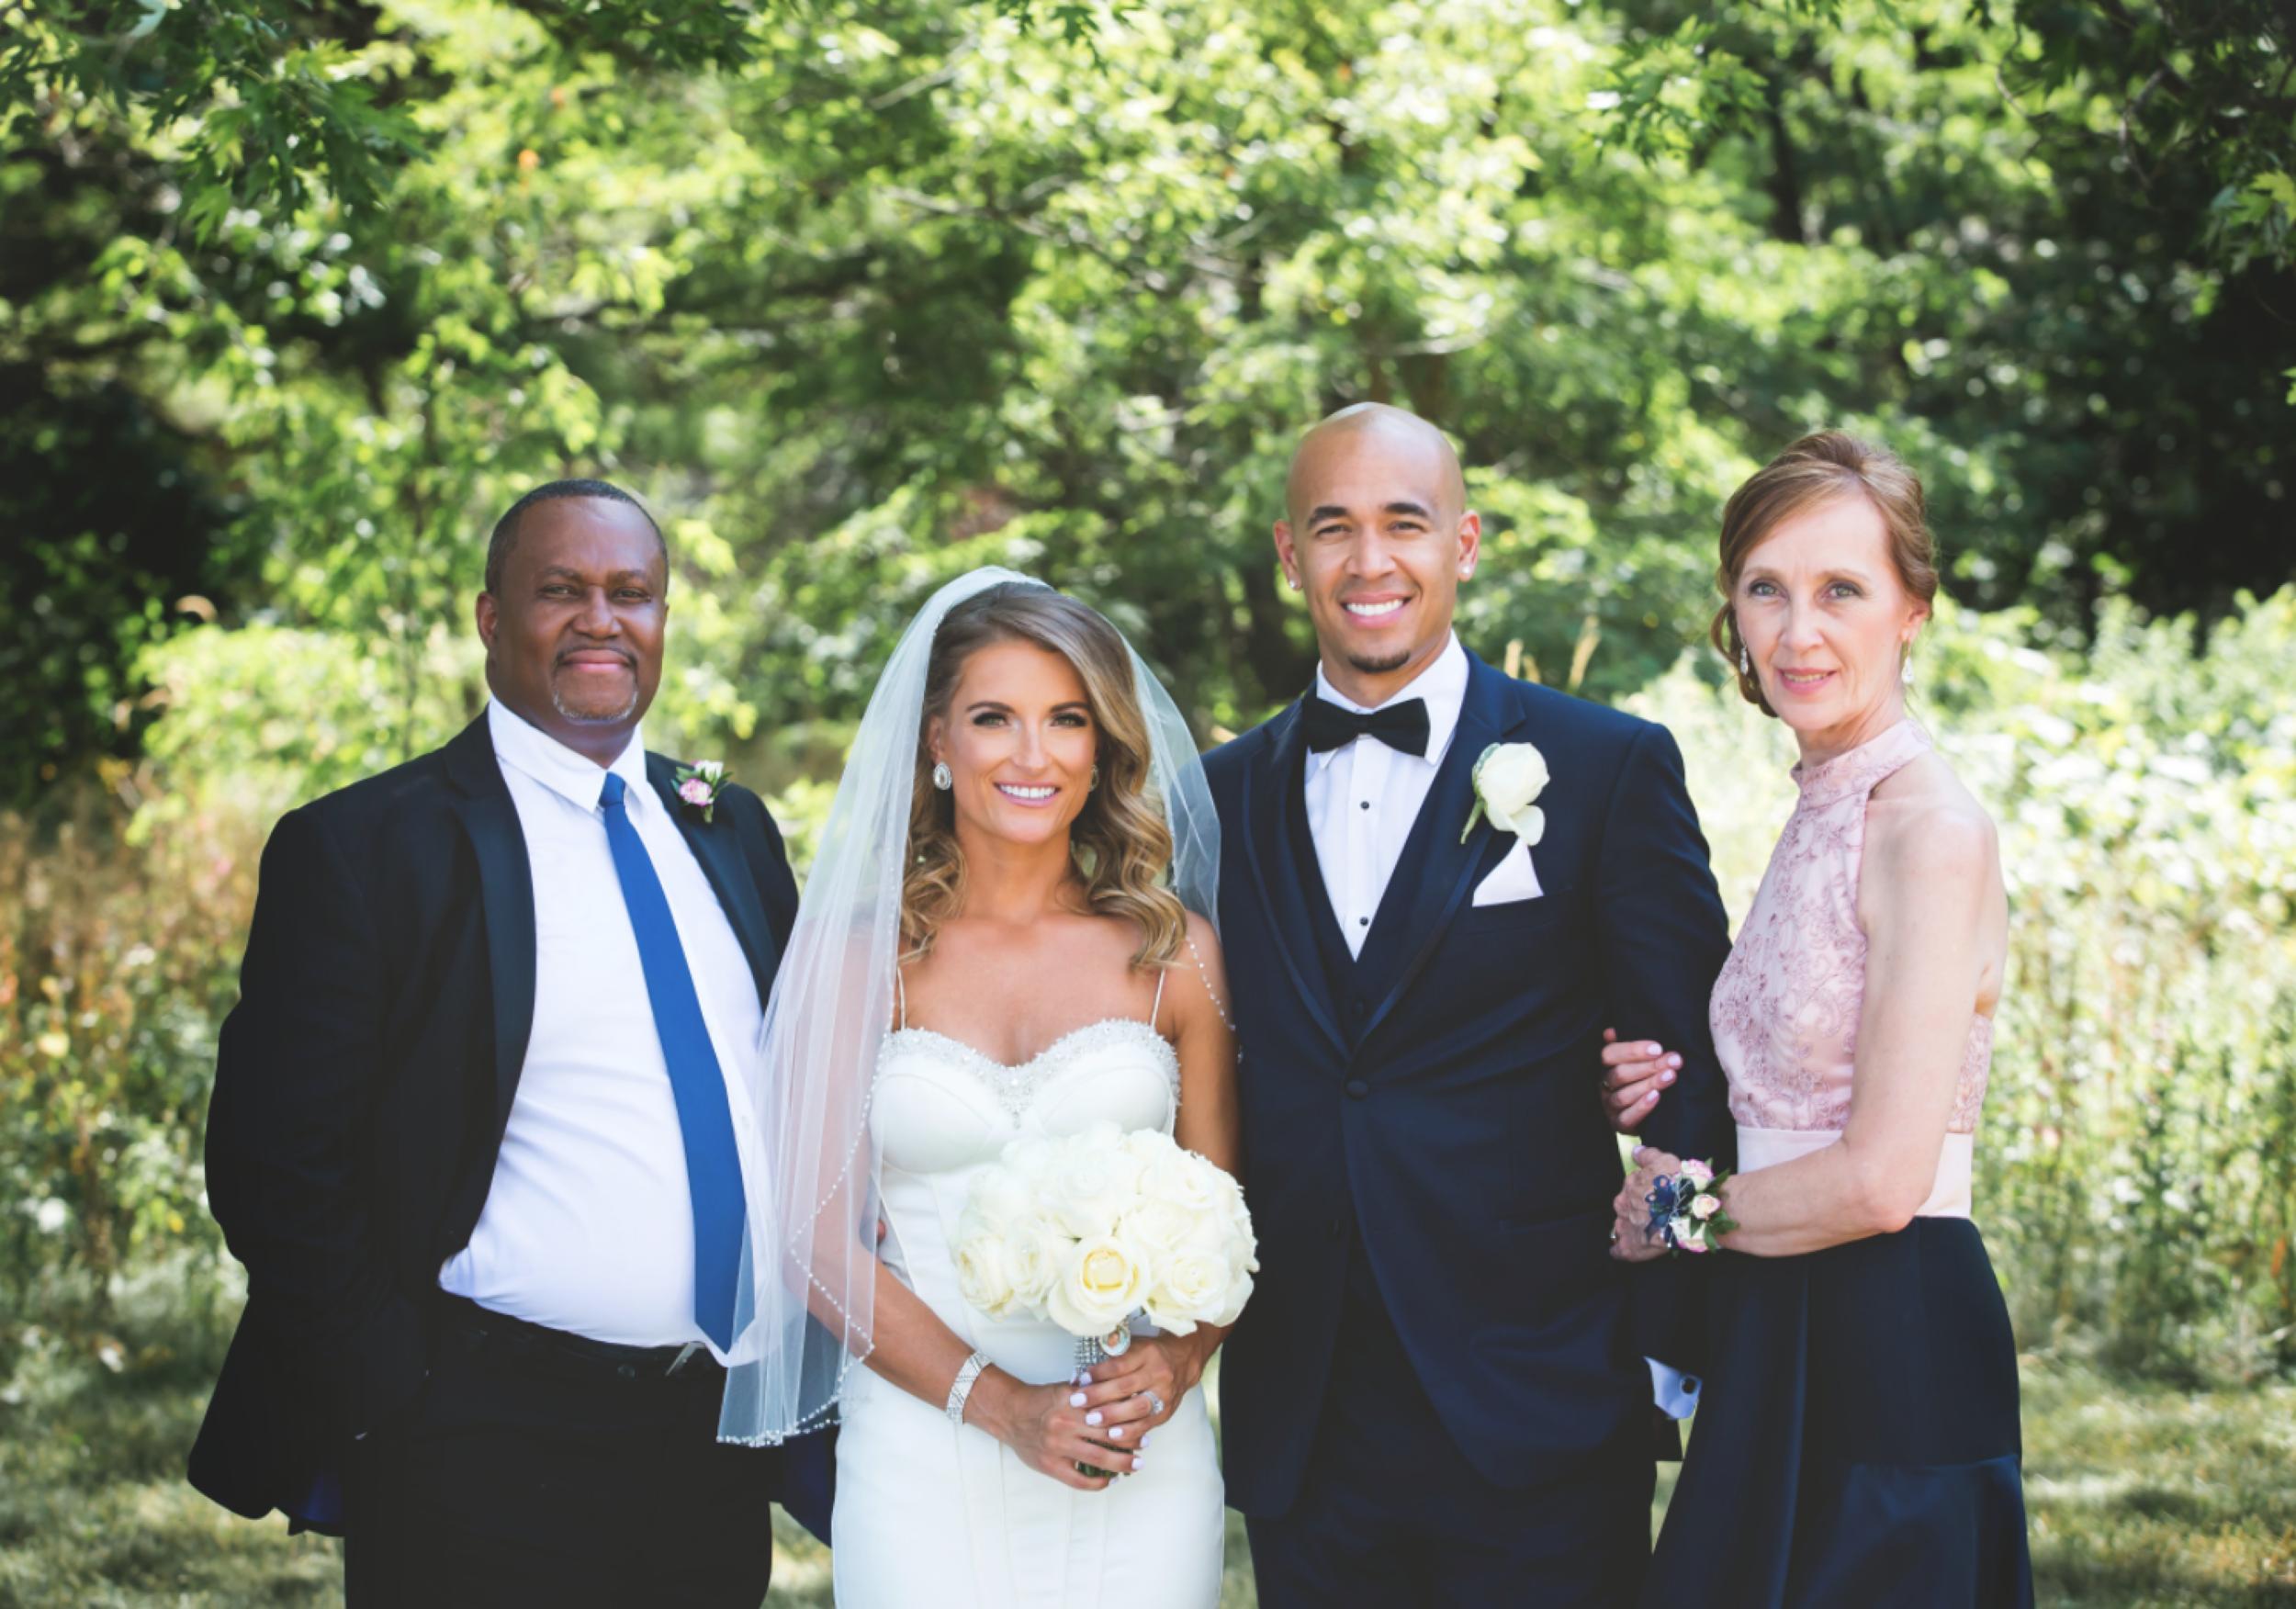 Wedding-Burlington-Convention-Center-Burlington-Oakville-Toronto-Hamilton-Niagara-Wedding-Photographer-Photography-Moments-by-Lauren-Photo-Image-26.png